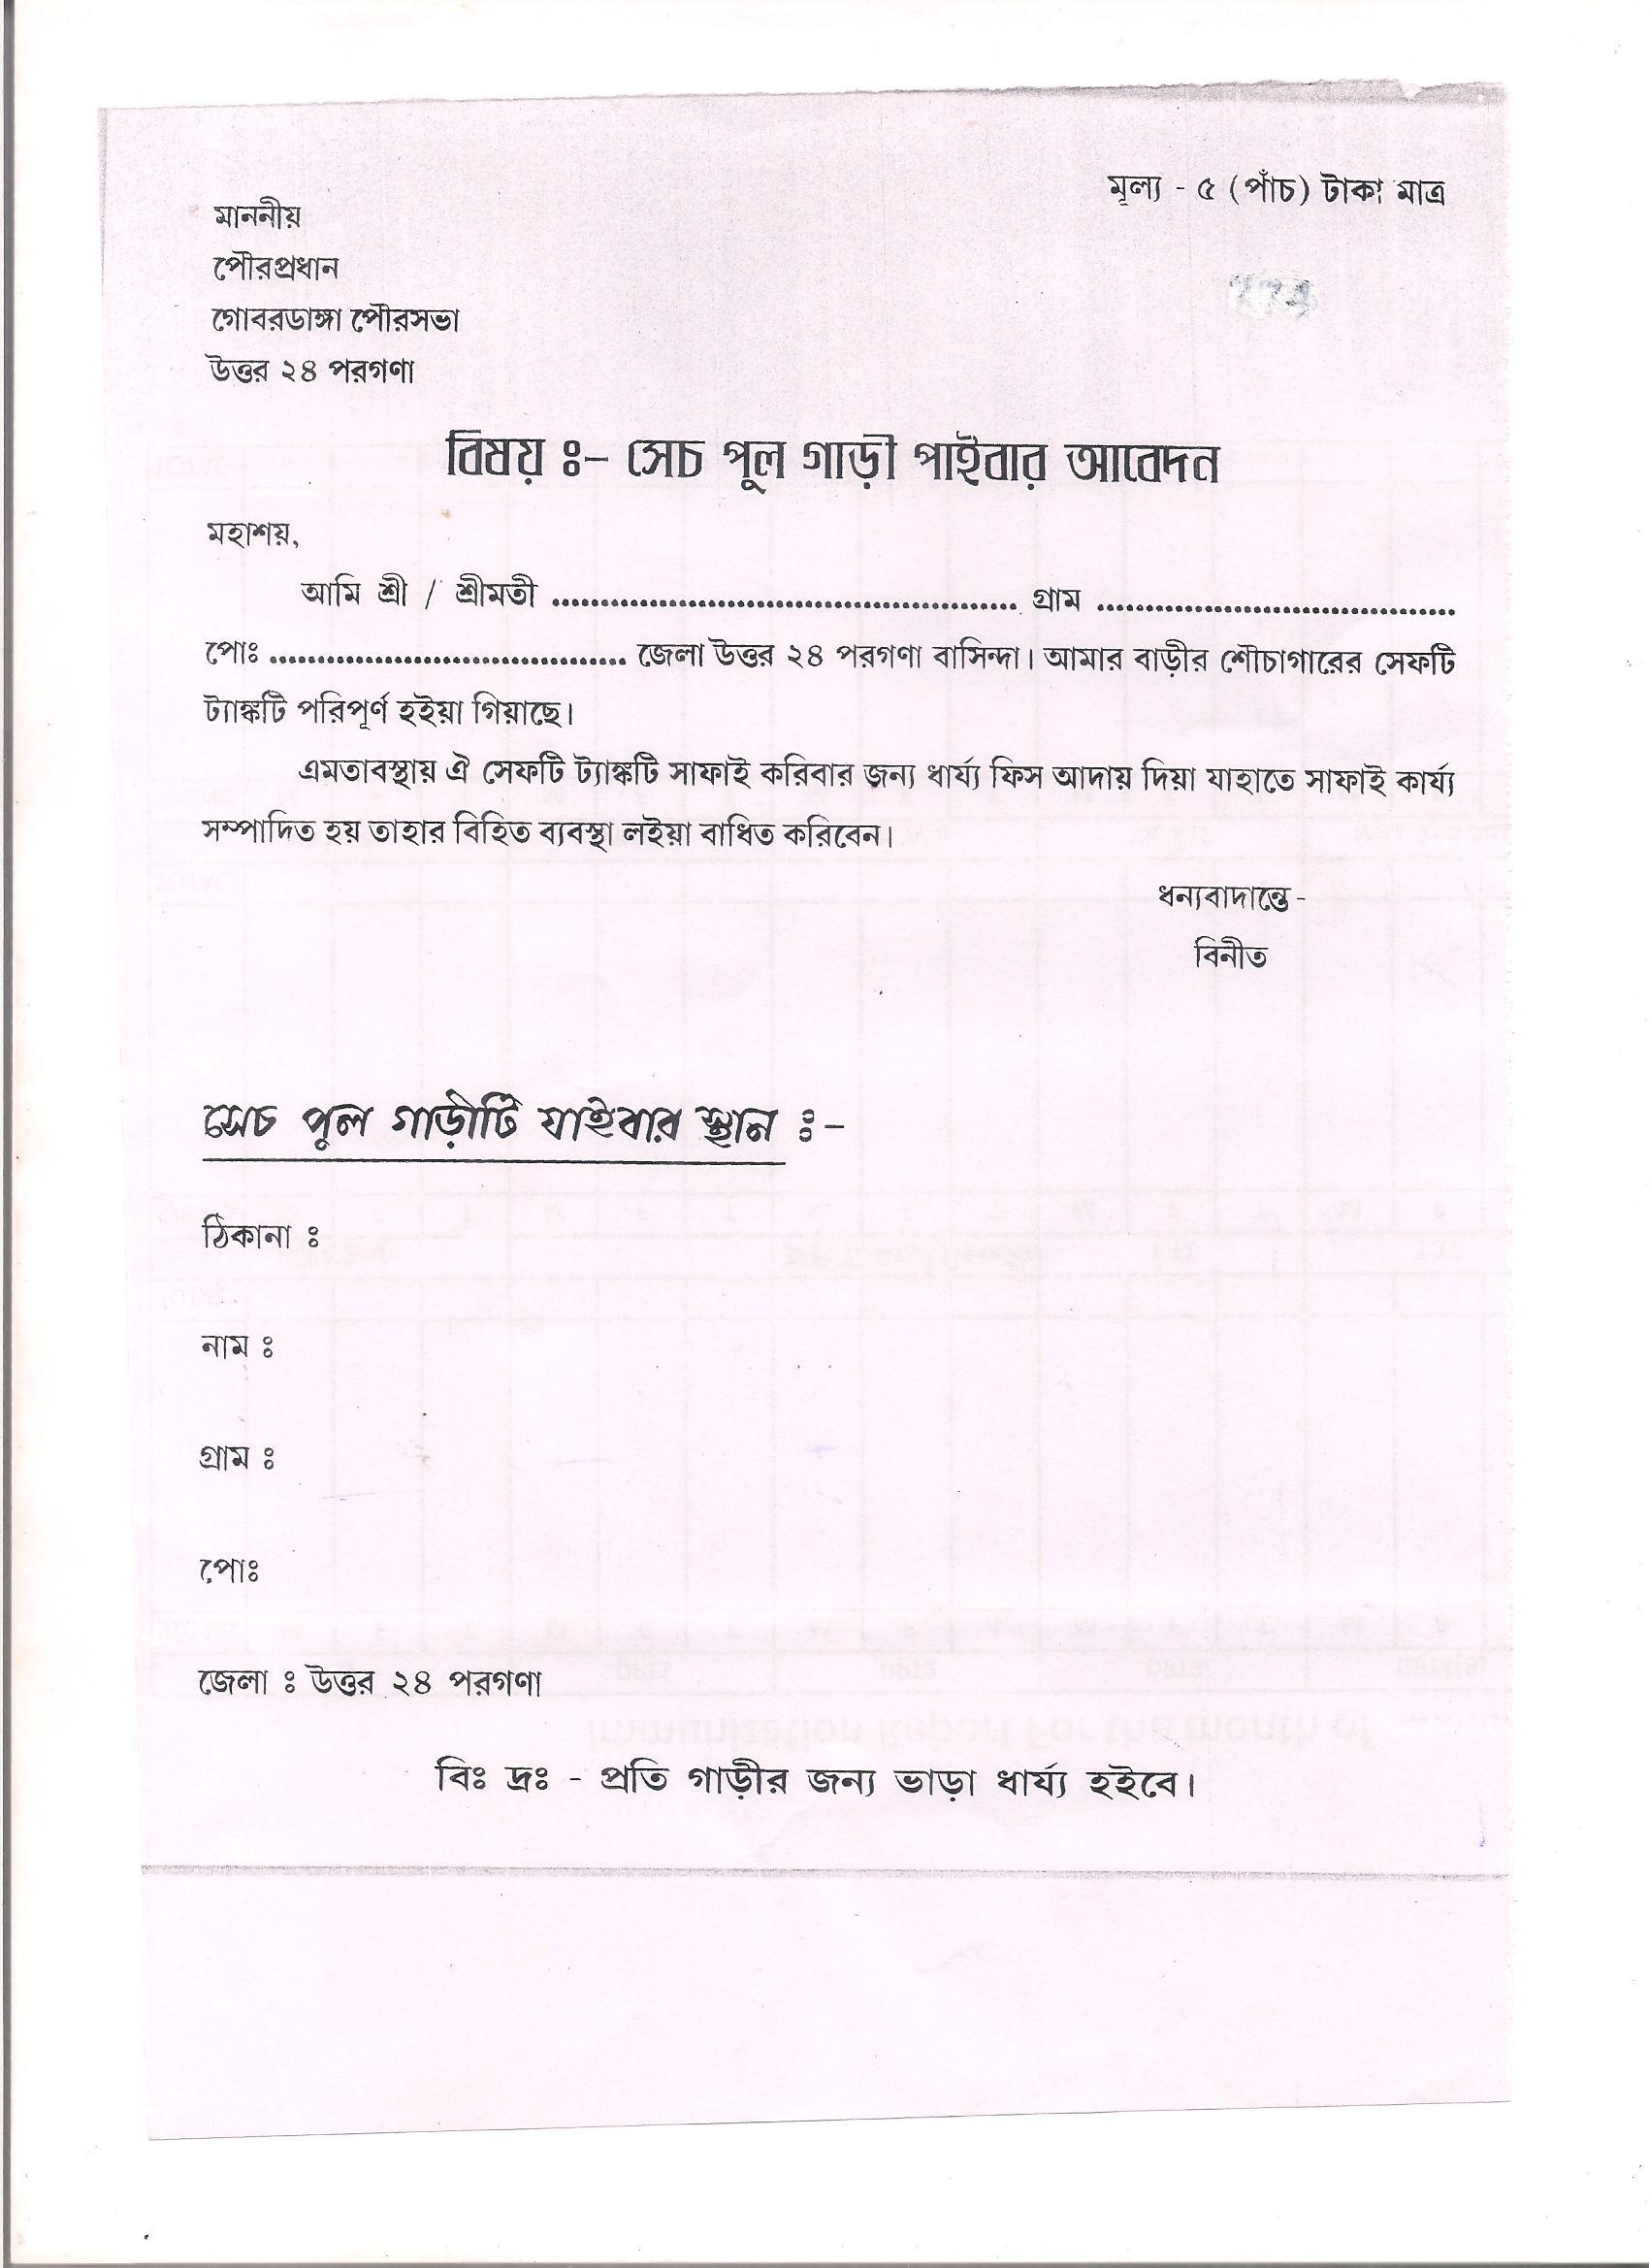 legal heir certificate online